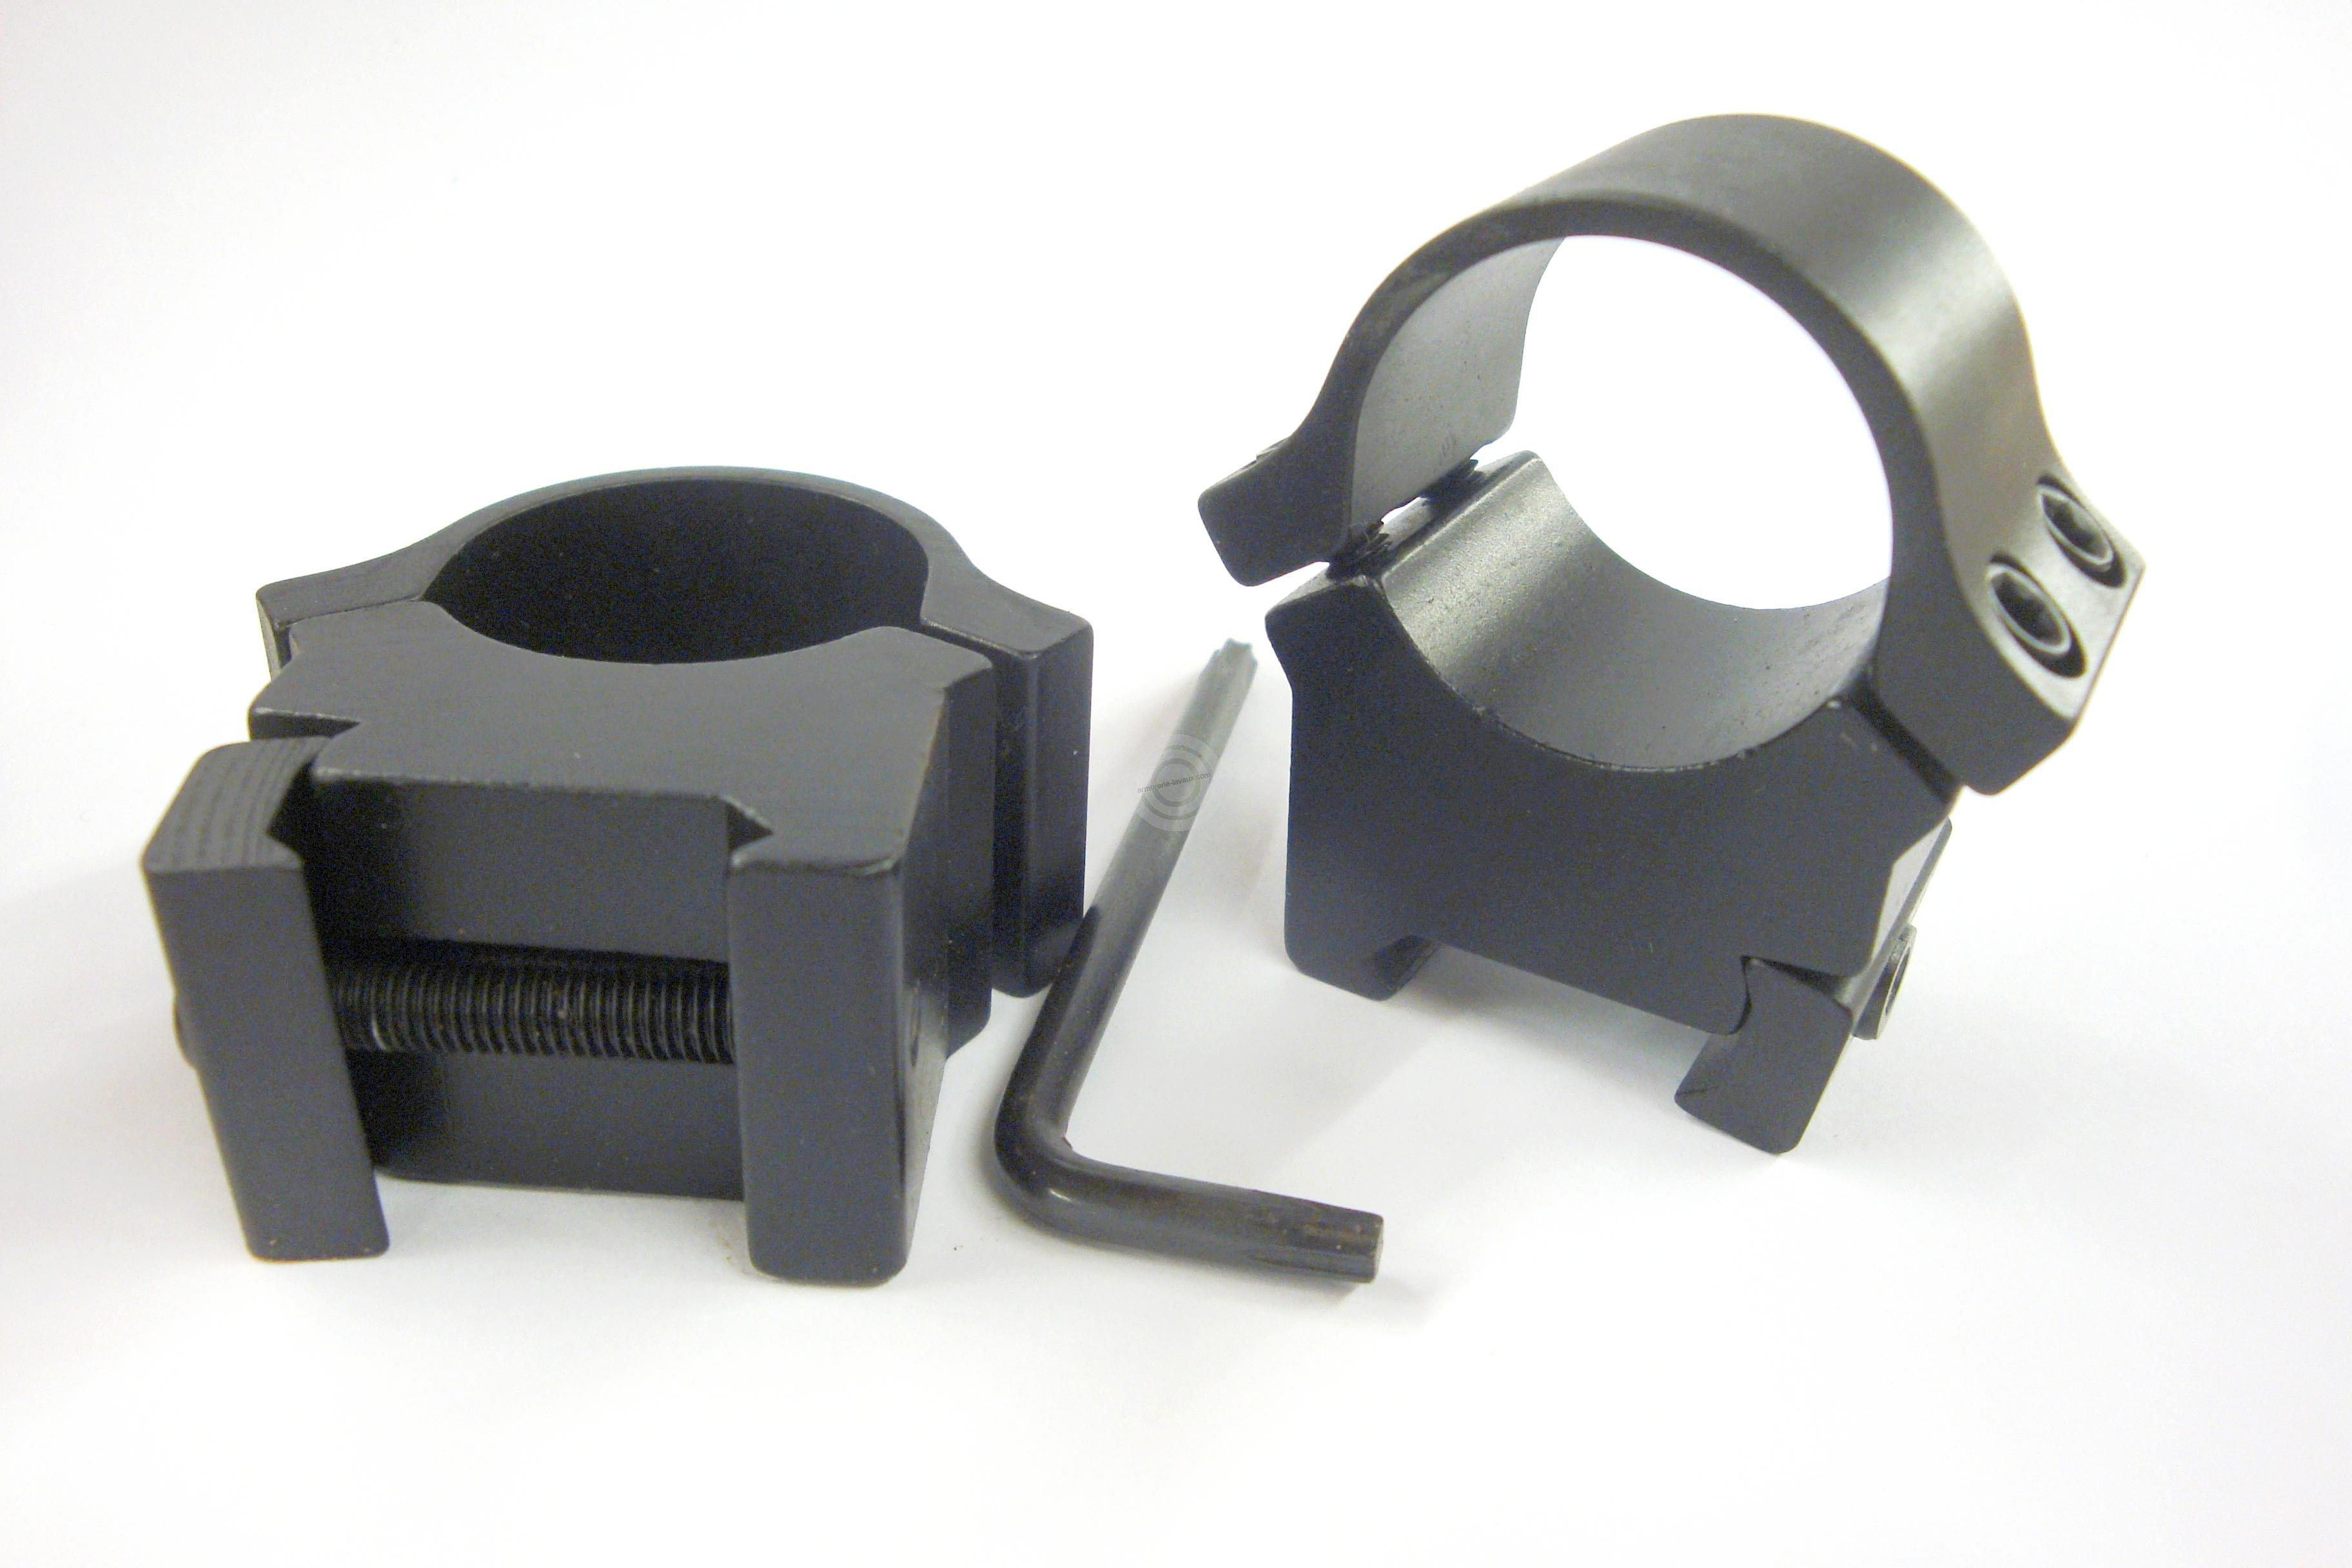 Montage Medium FUZYON diamètre 25.4mm - Rail de 21mm BH 13